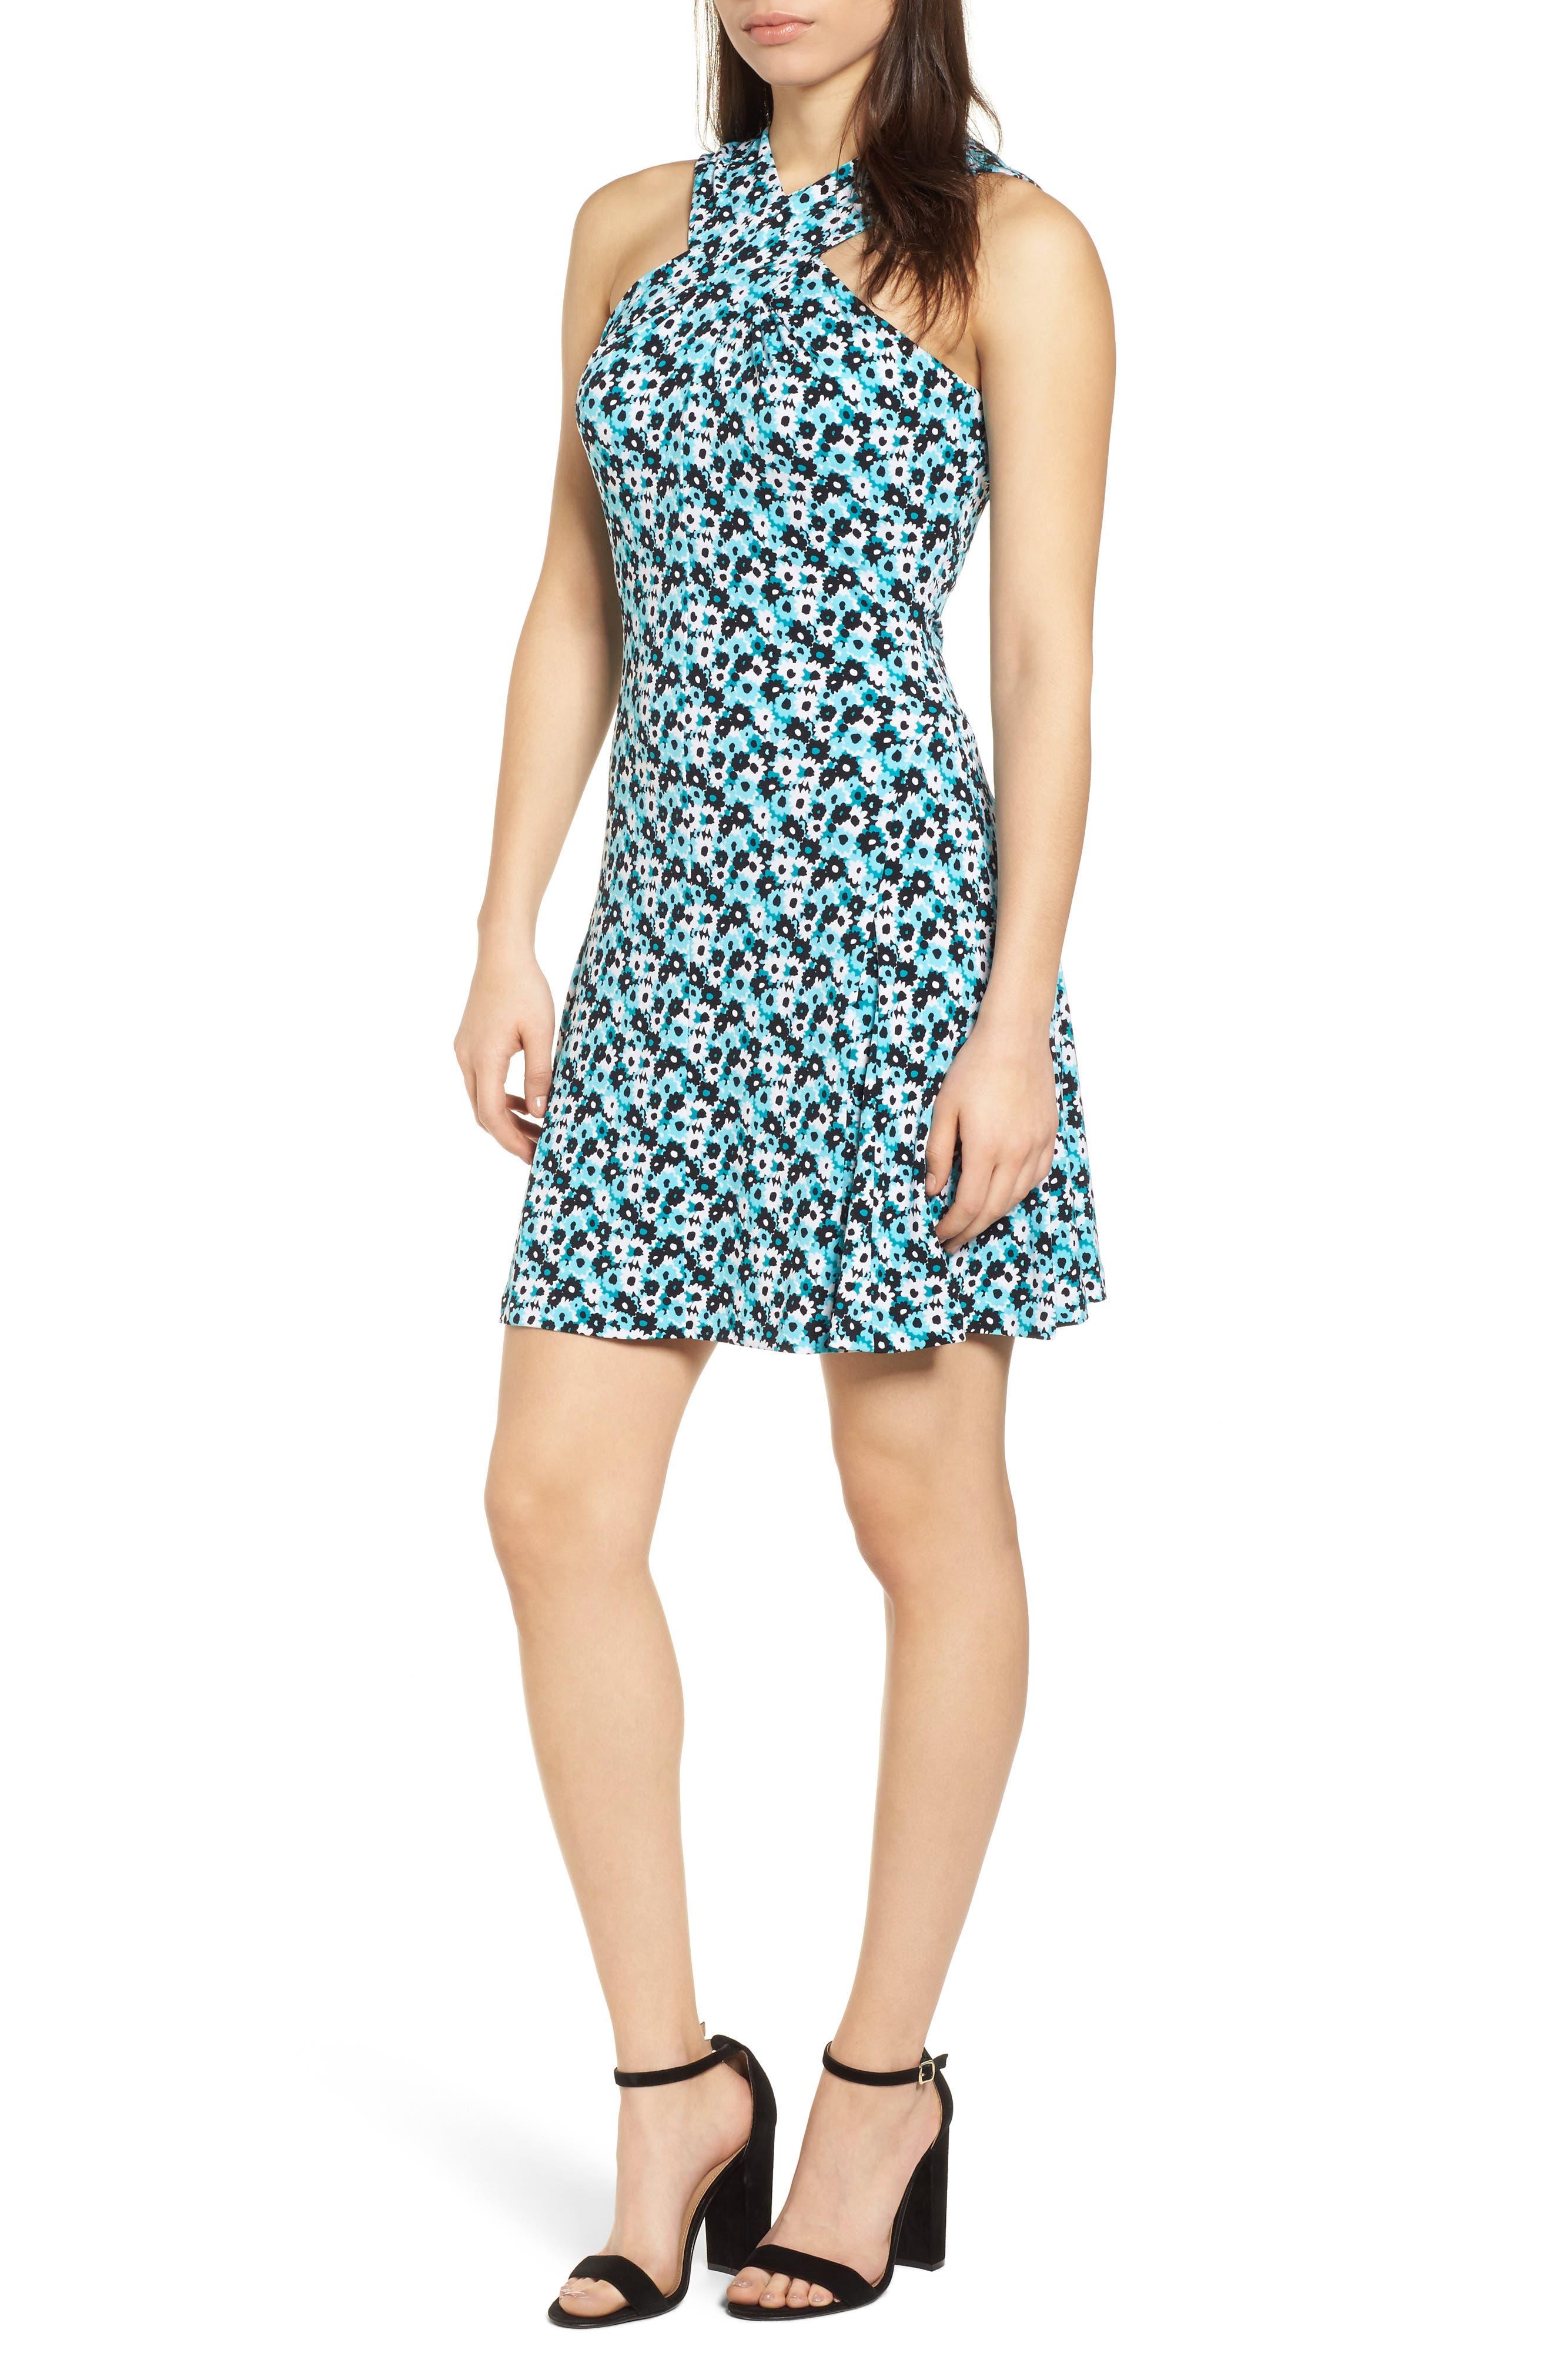 Carnations Cross Neck Fit and Flare Dress,                         Main,                         color, Tile Blue/ Black Multi